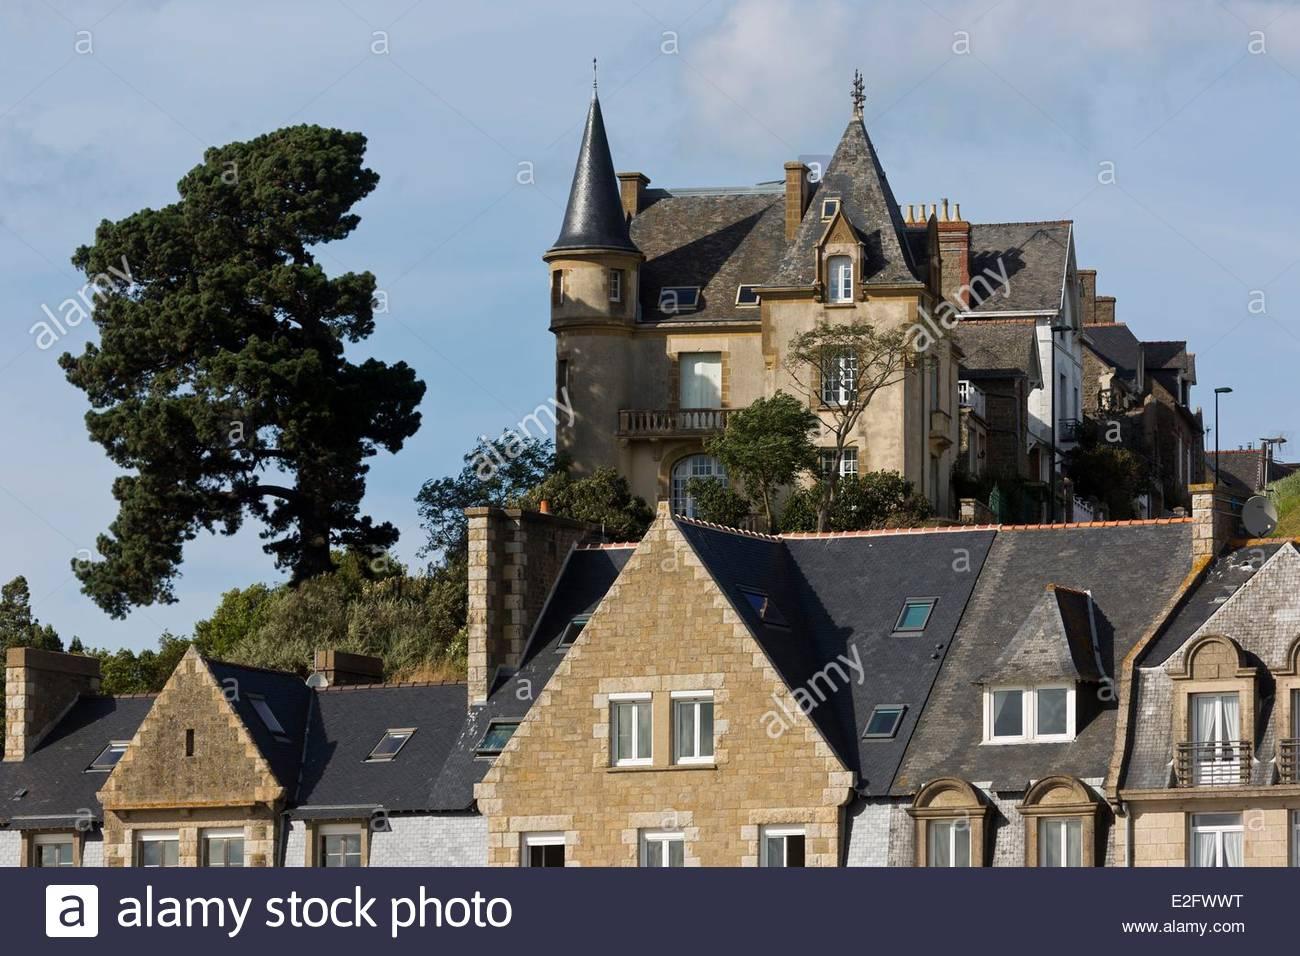 France Ille Et Vilaine Cote Du0027Emeraude (Emerald Coast) Cancale Old Houses  Overlooking